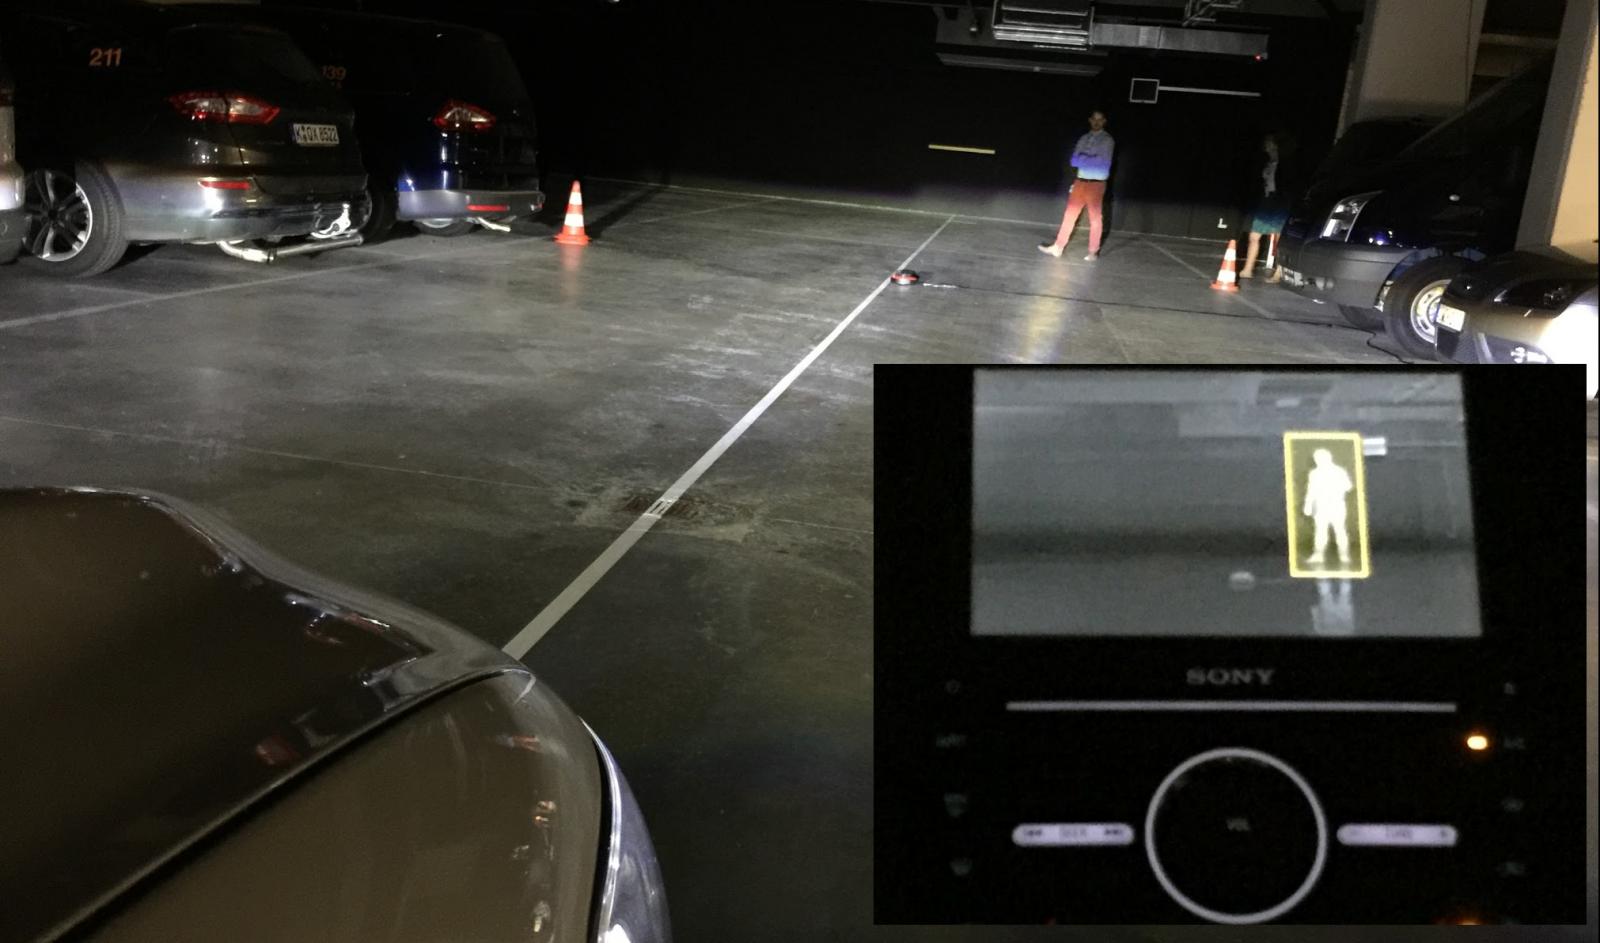 Ford intelligent lighting system